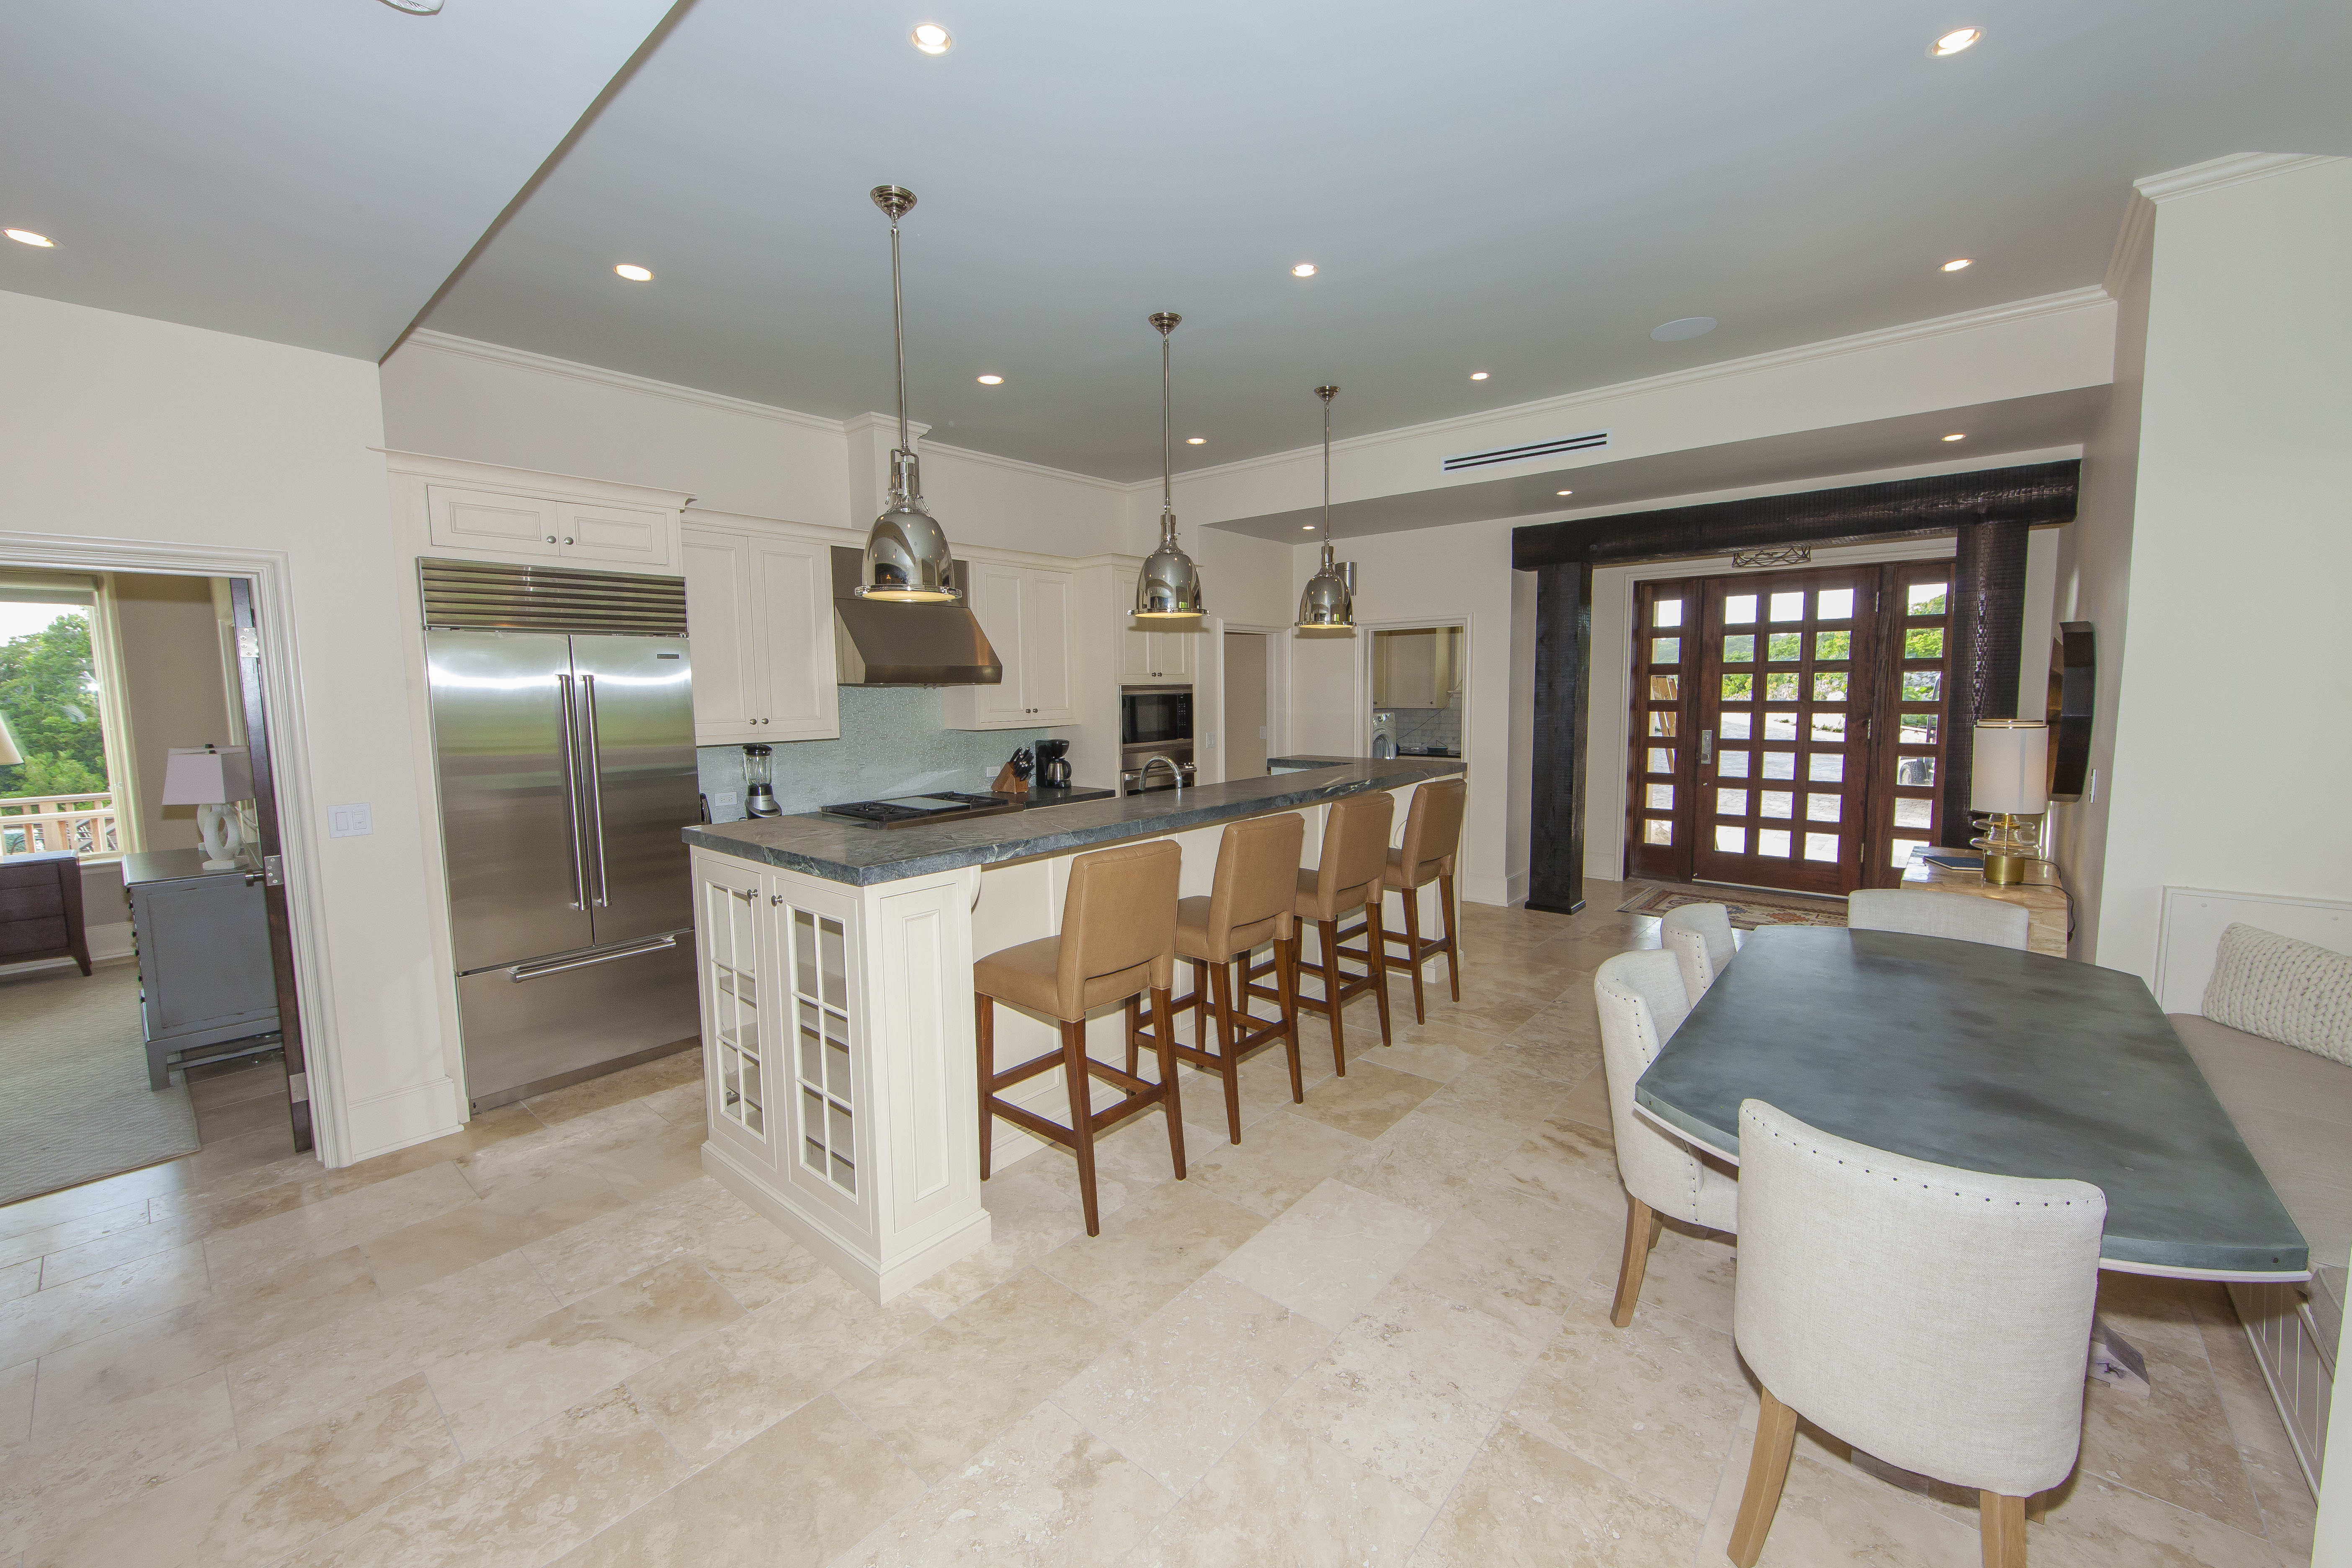 Upper Kitchen/Dining Area